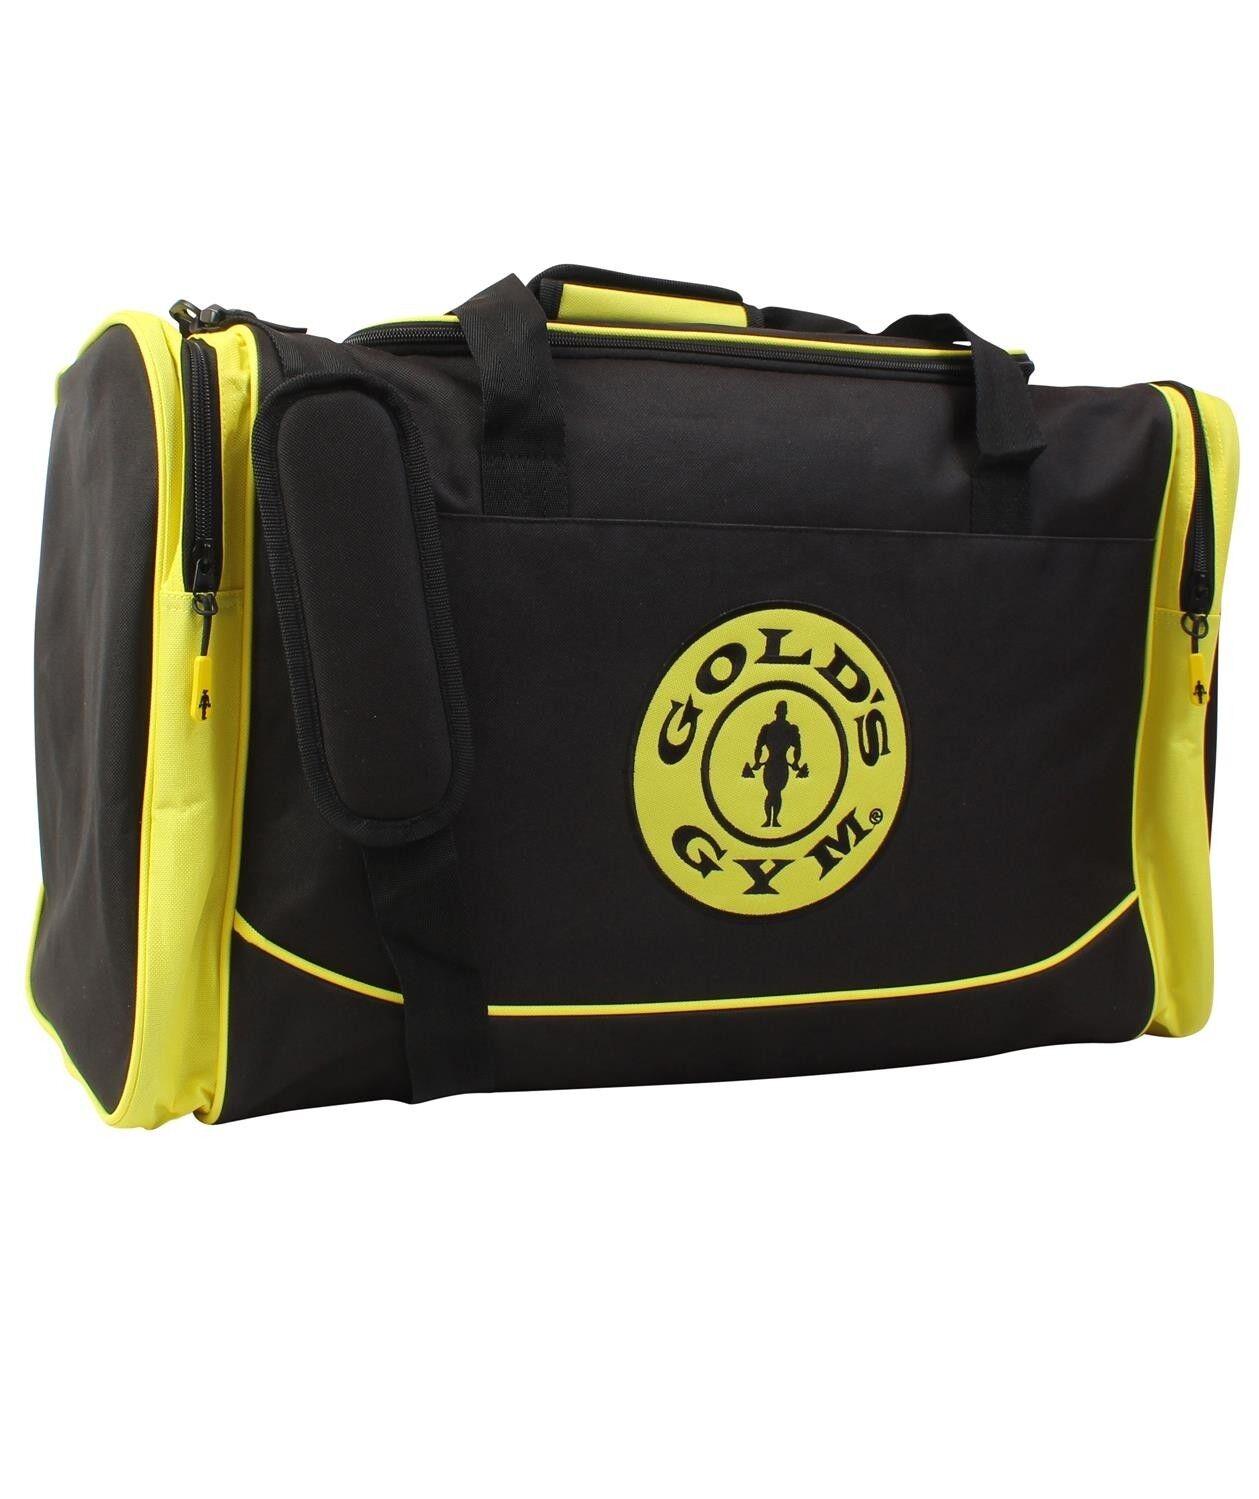 oro's Gym Borsone Sportbag Duffel BagHOLDALL BAG